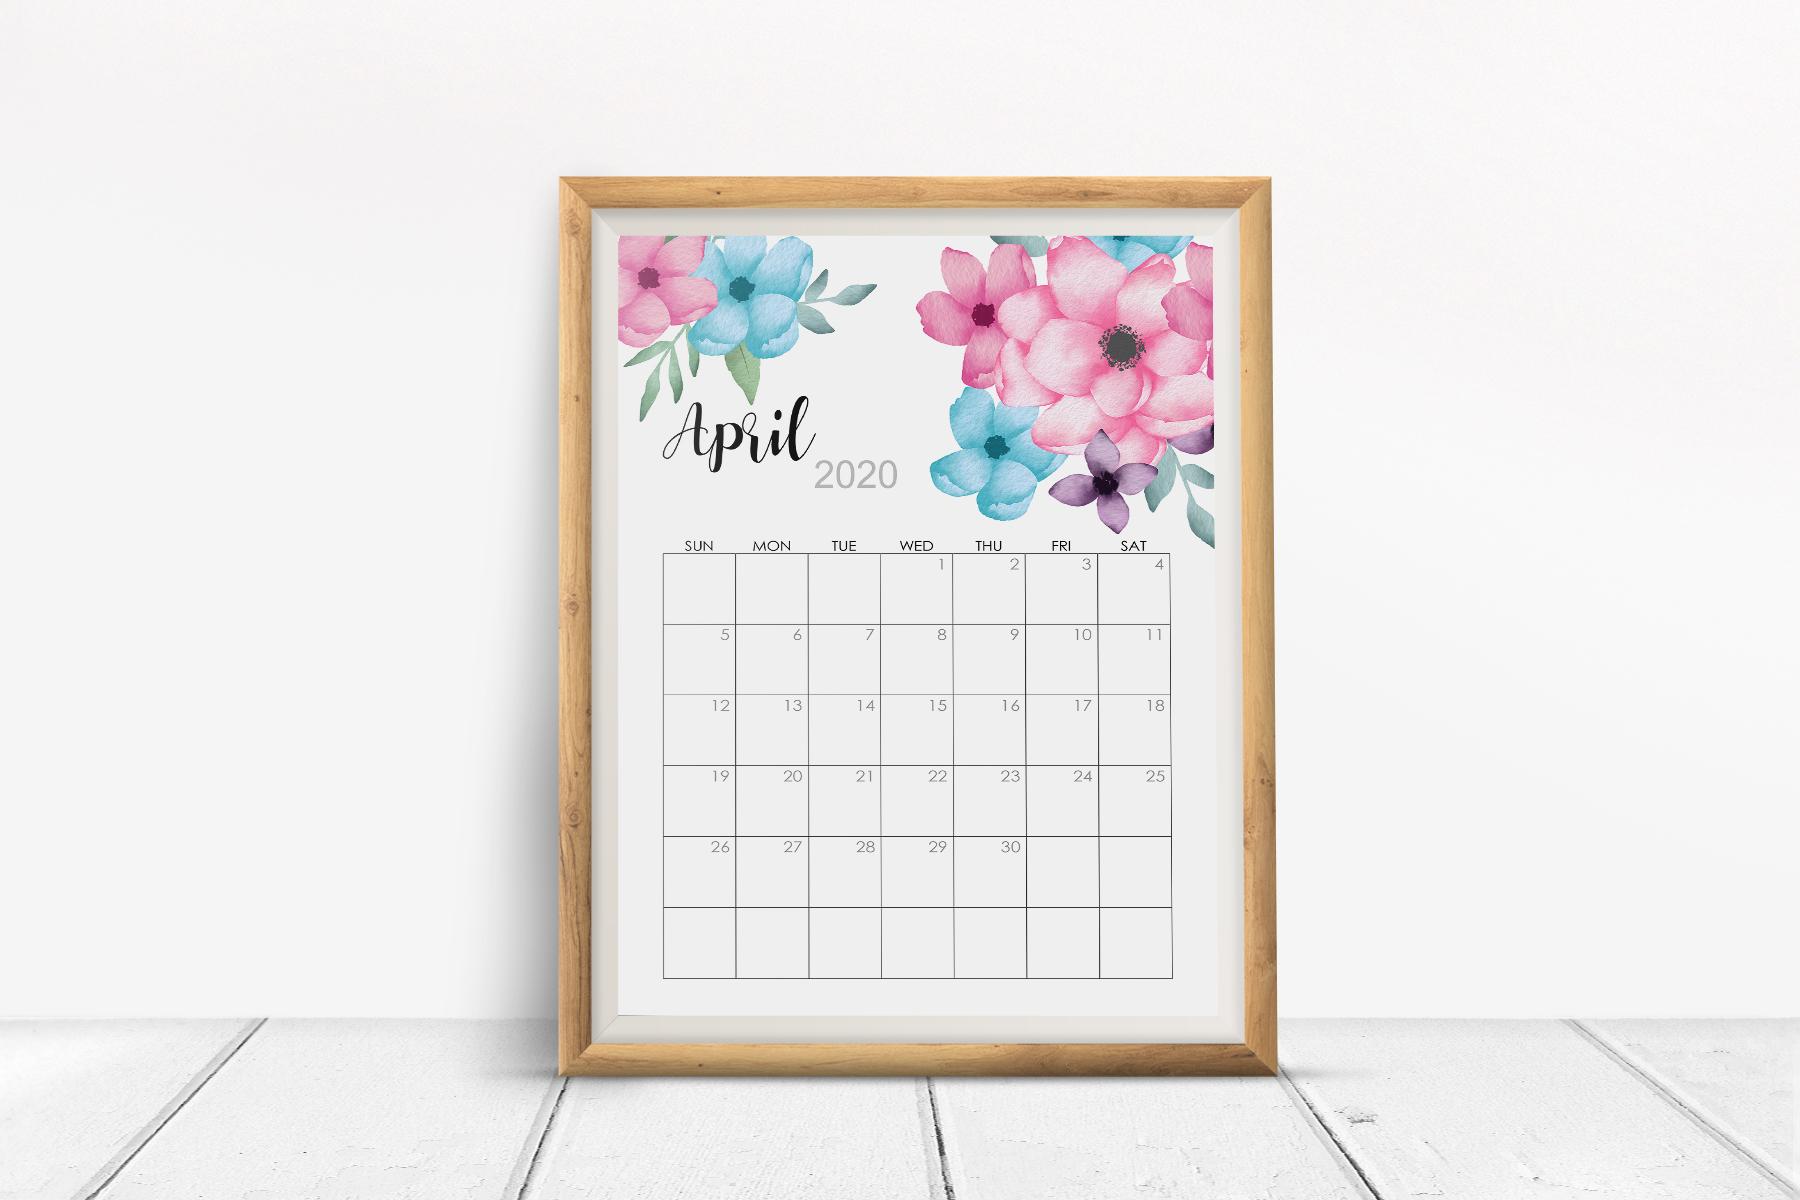 2020 Flowers Calendar Printable, Watercolor Botanical Floral example image 2